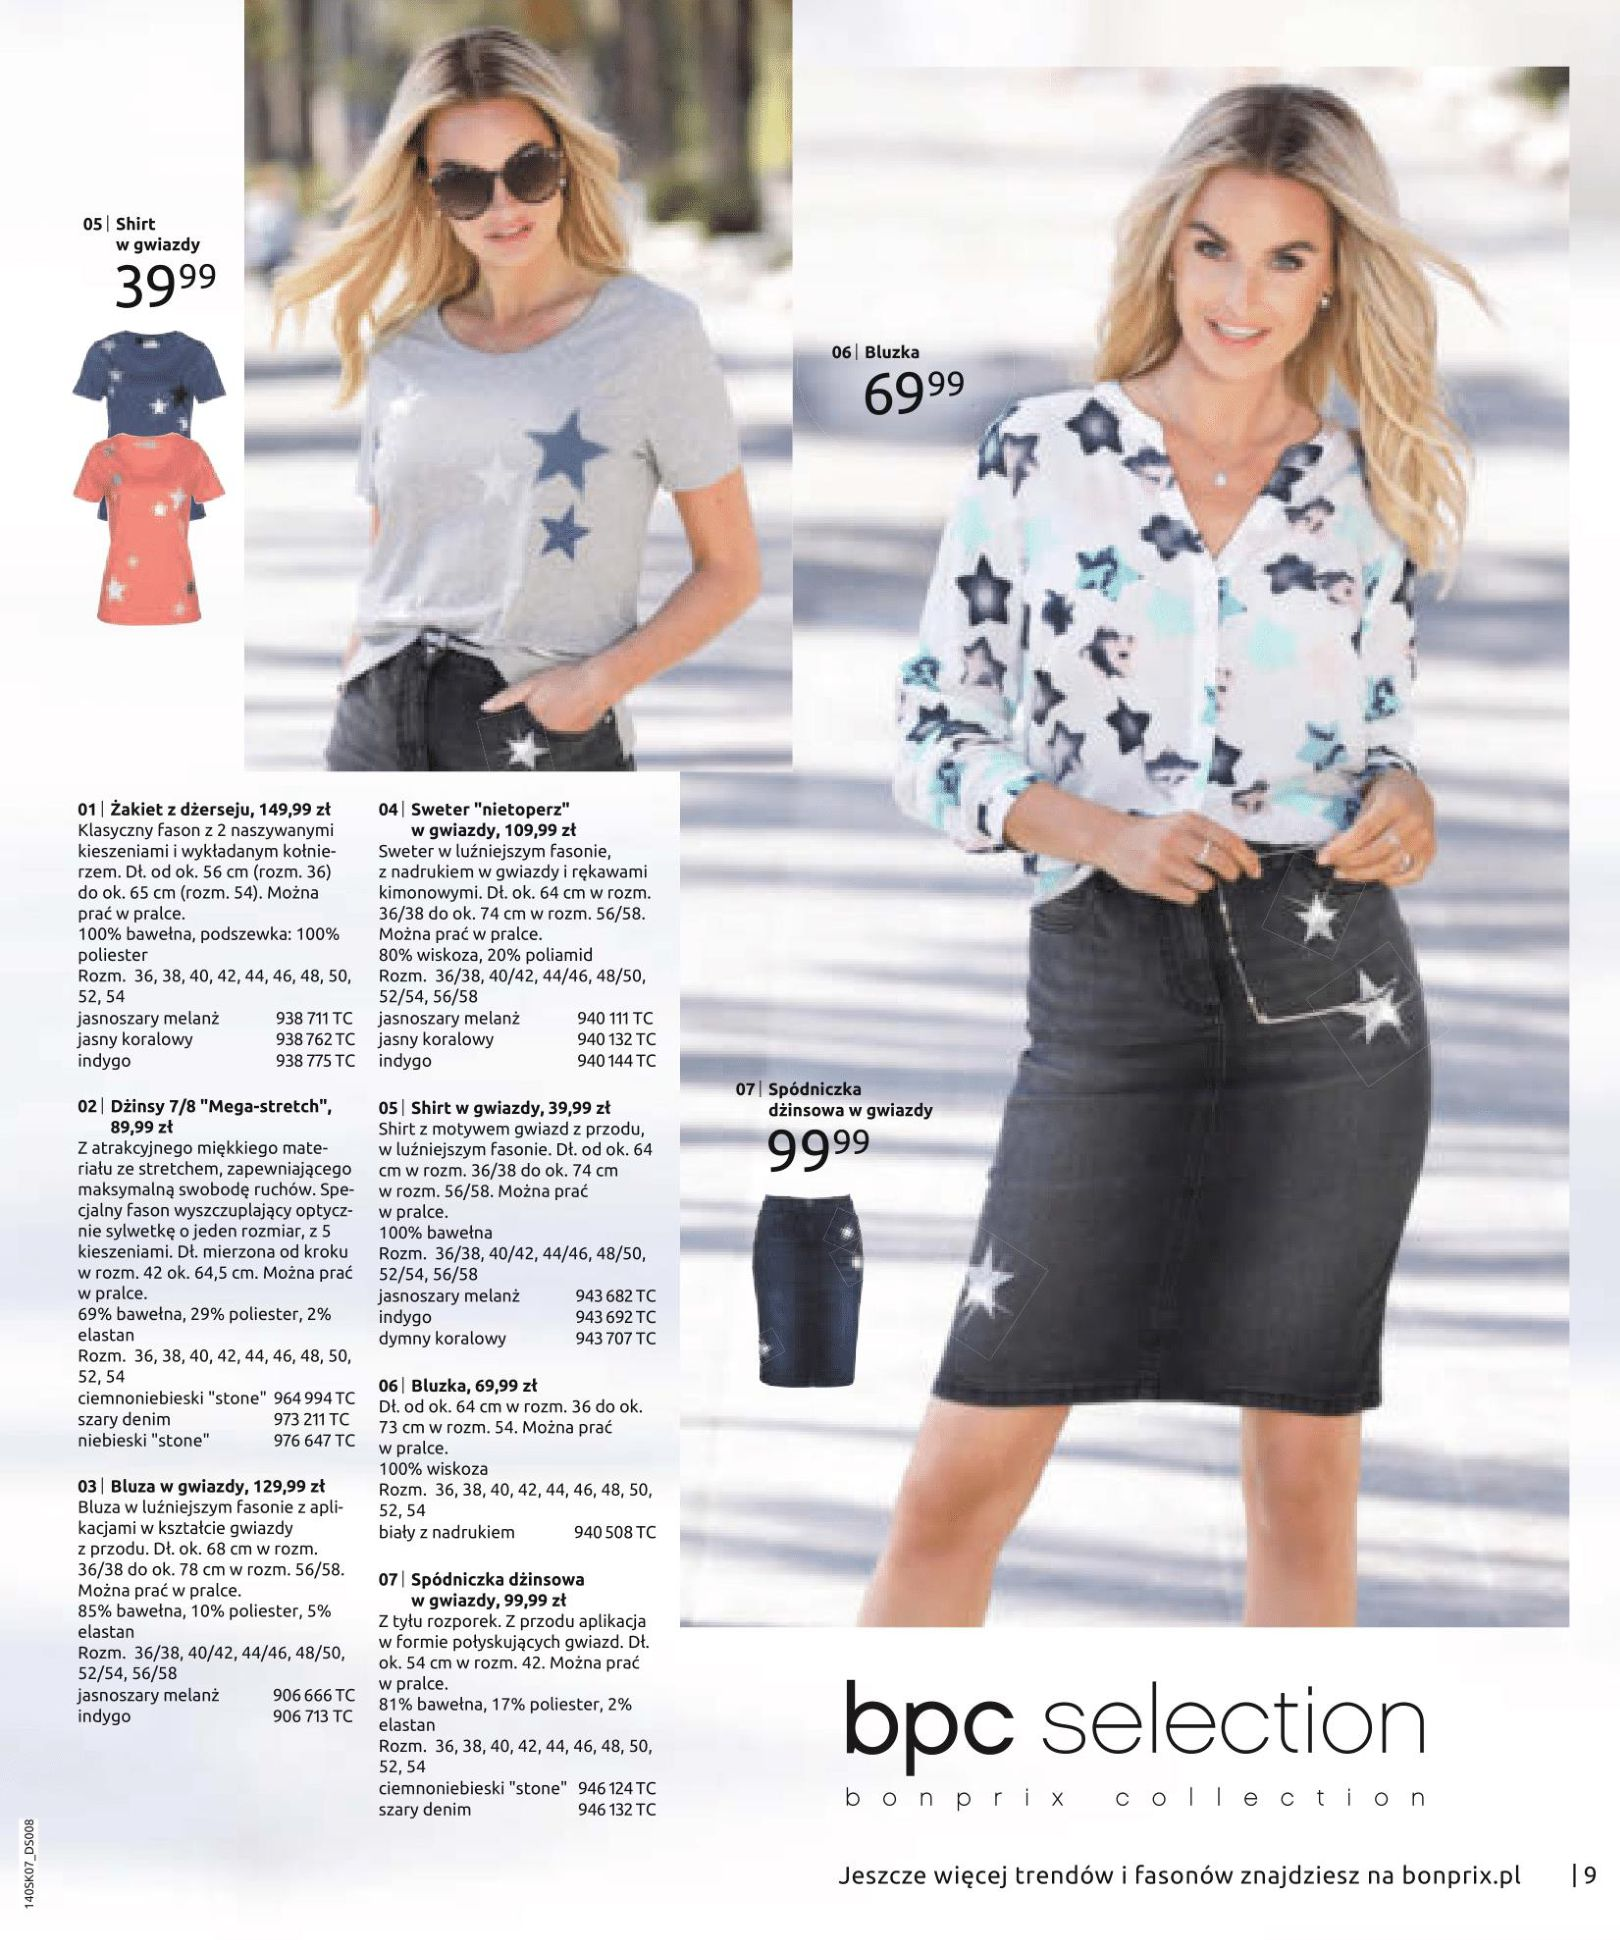 Gazetka Bonprix - Letnie trendy-02.07.2019-15.01.2020-page-11